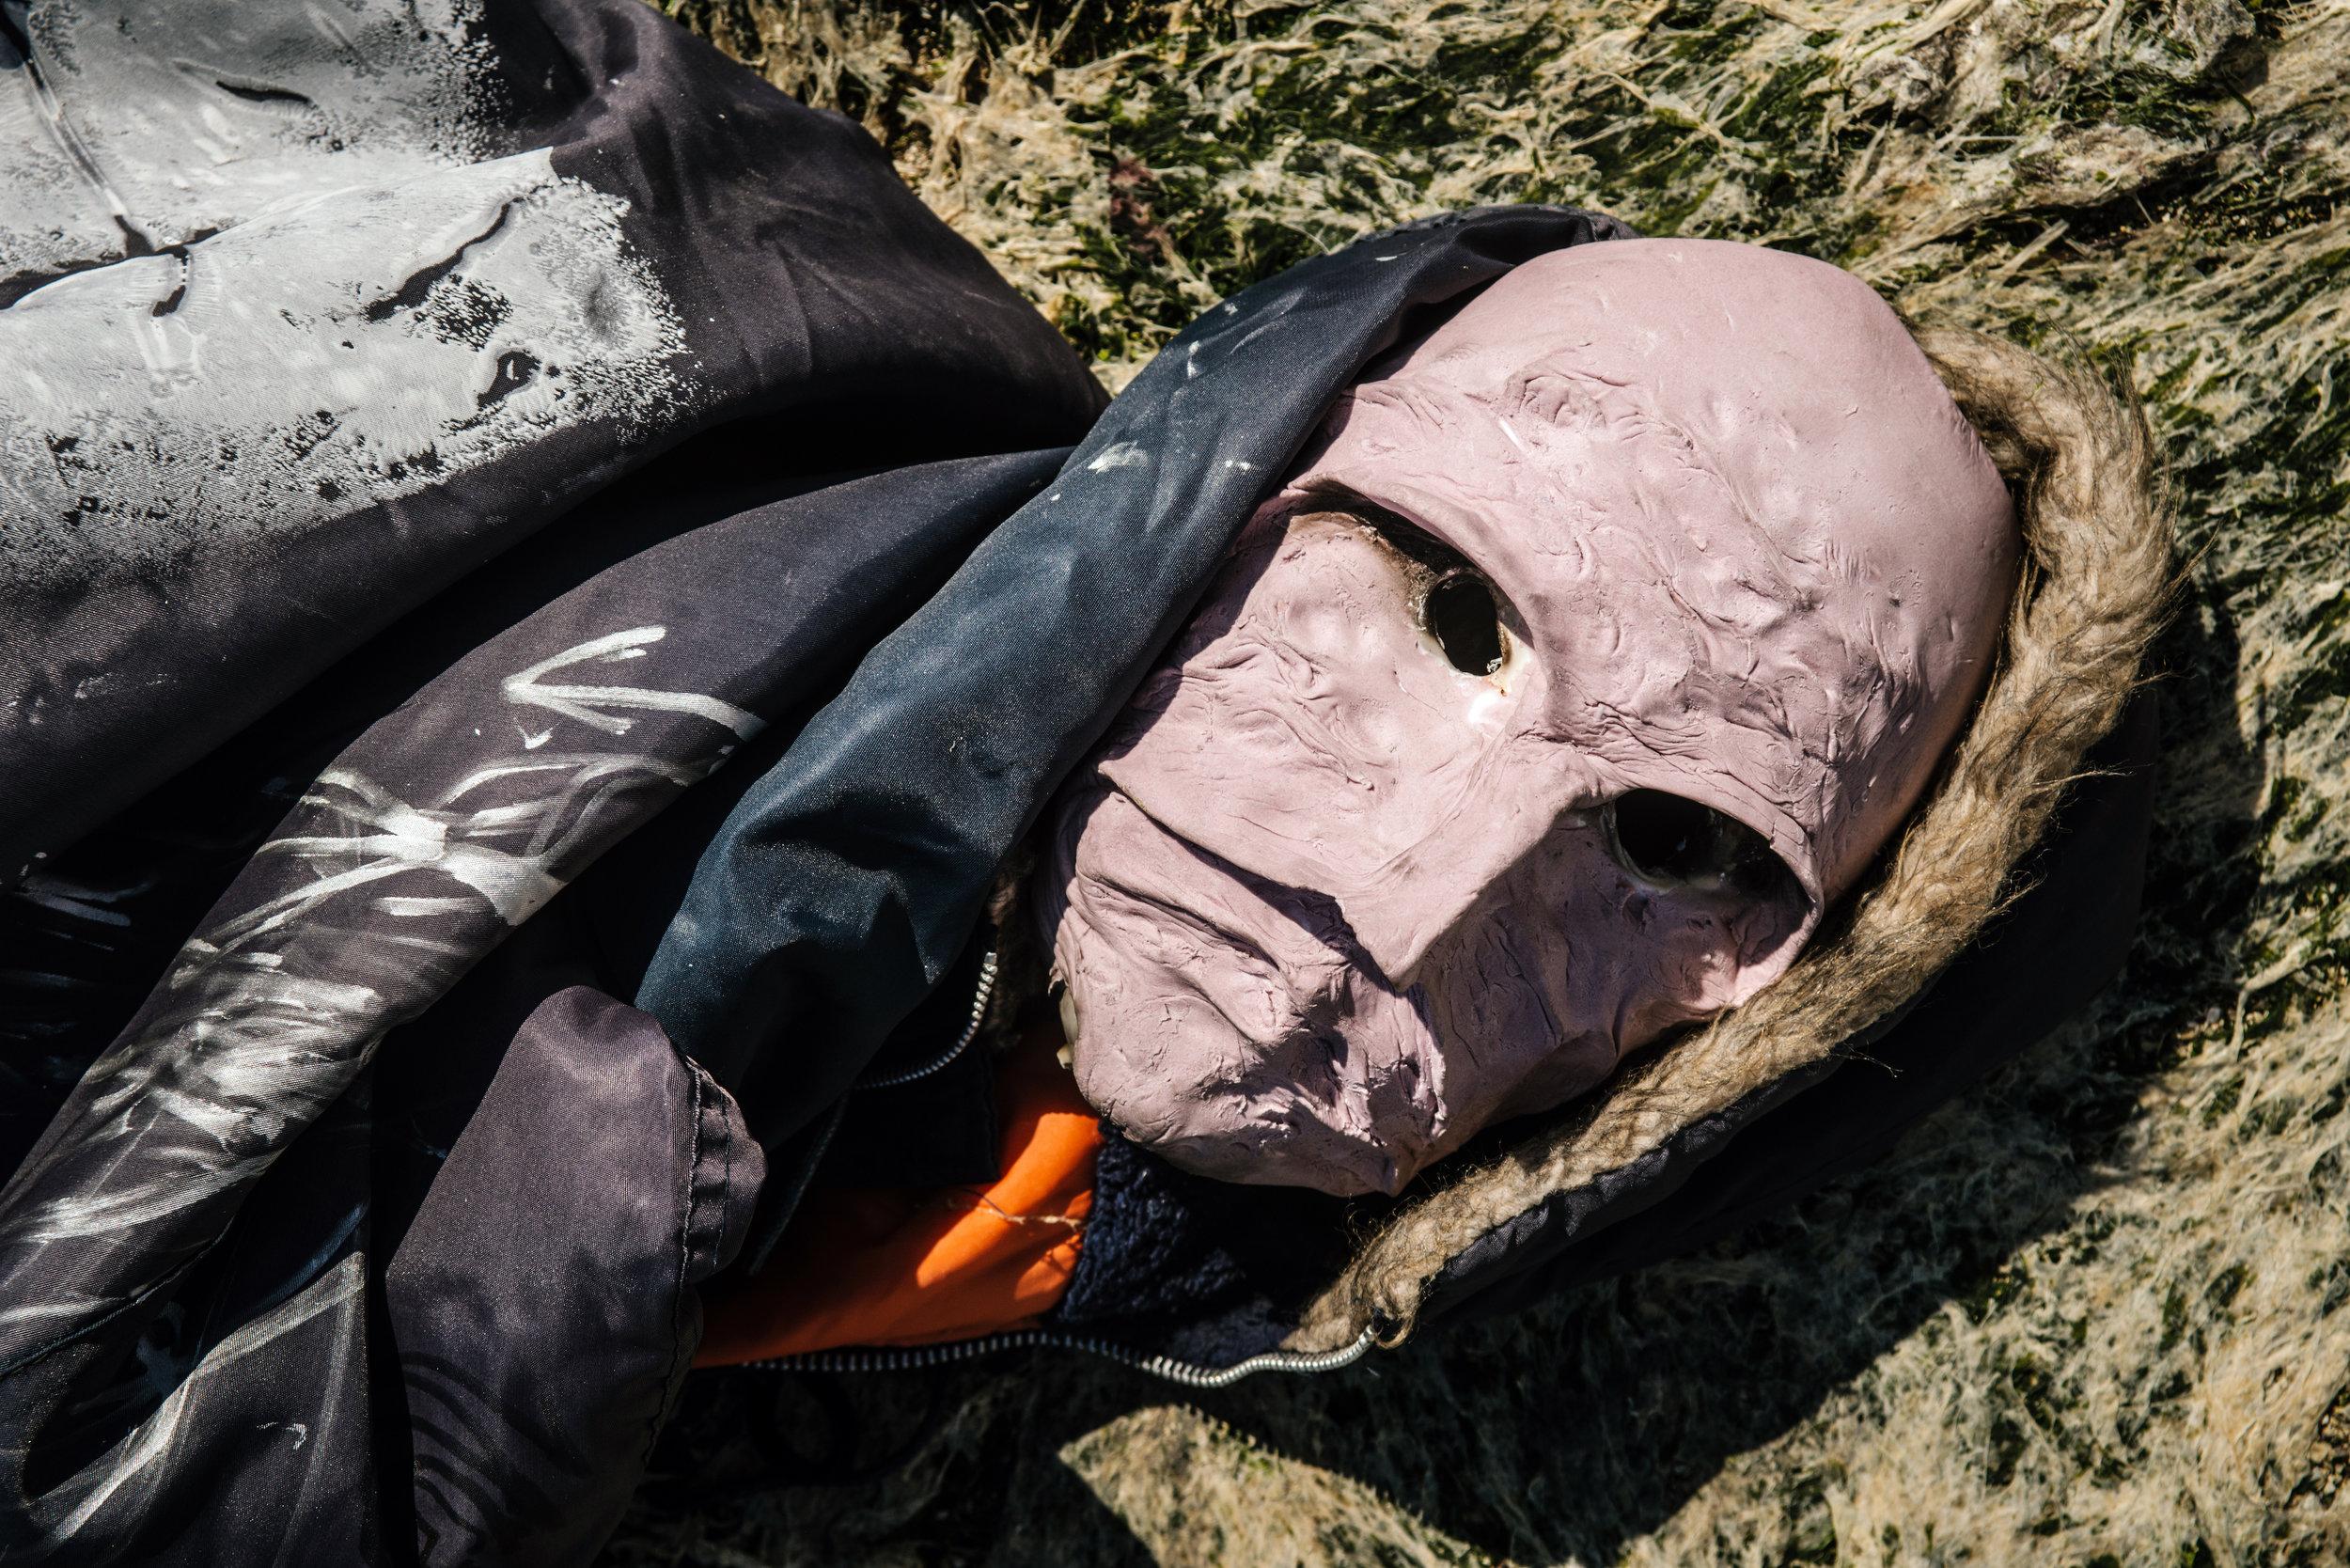 Untitled Mask (1) by Pasha Bezor, 2019